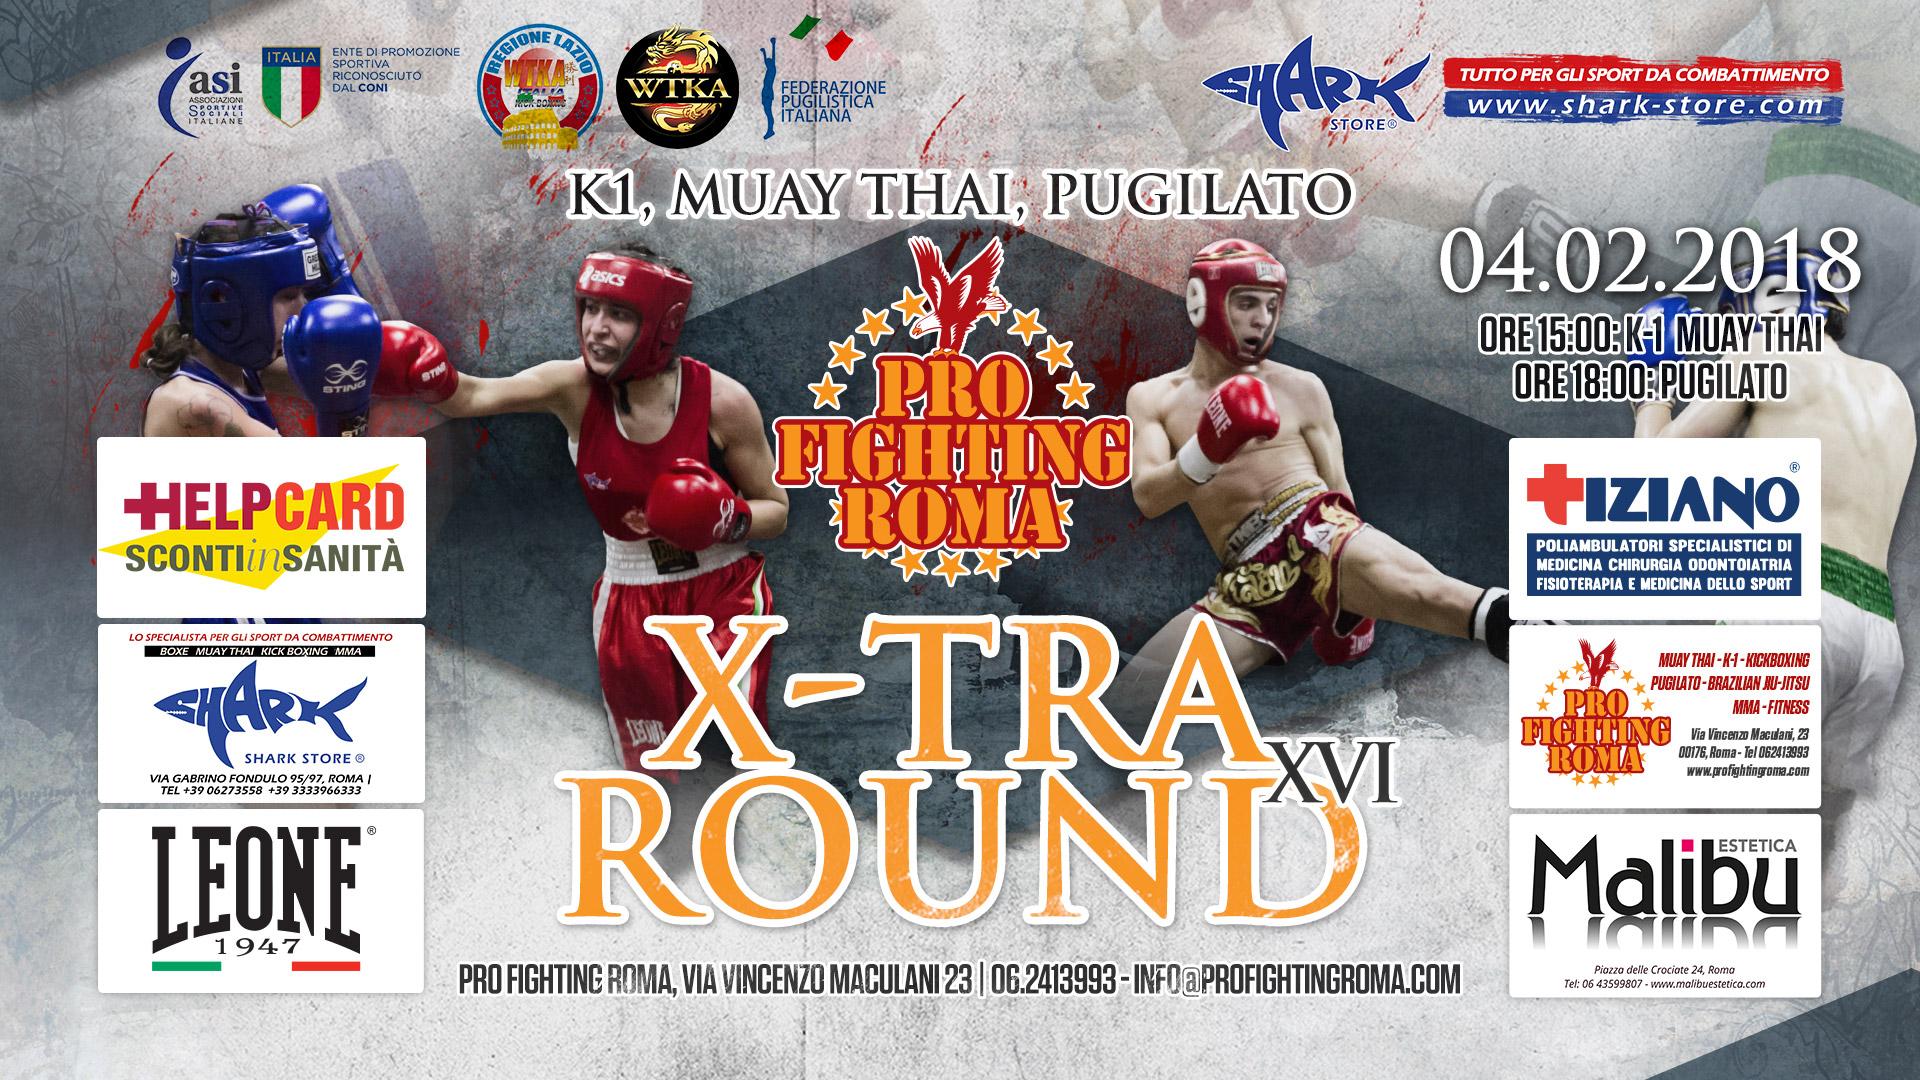 X-Tra Round XVI | K1, Muay Thai e Pugilato | Domenica 4 Febbraio